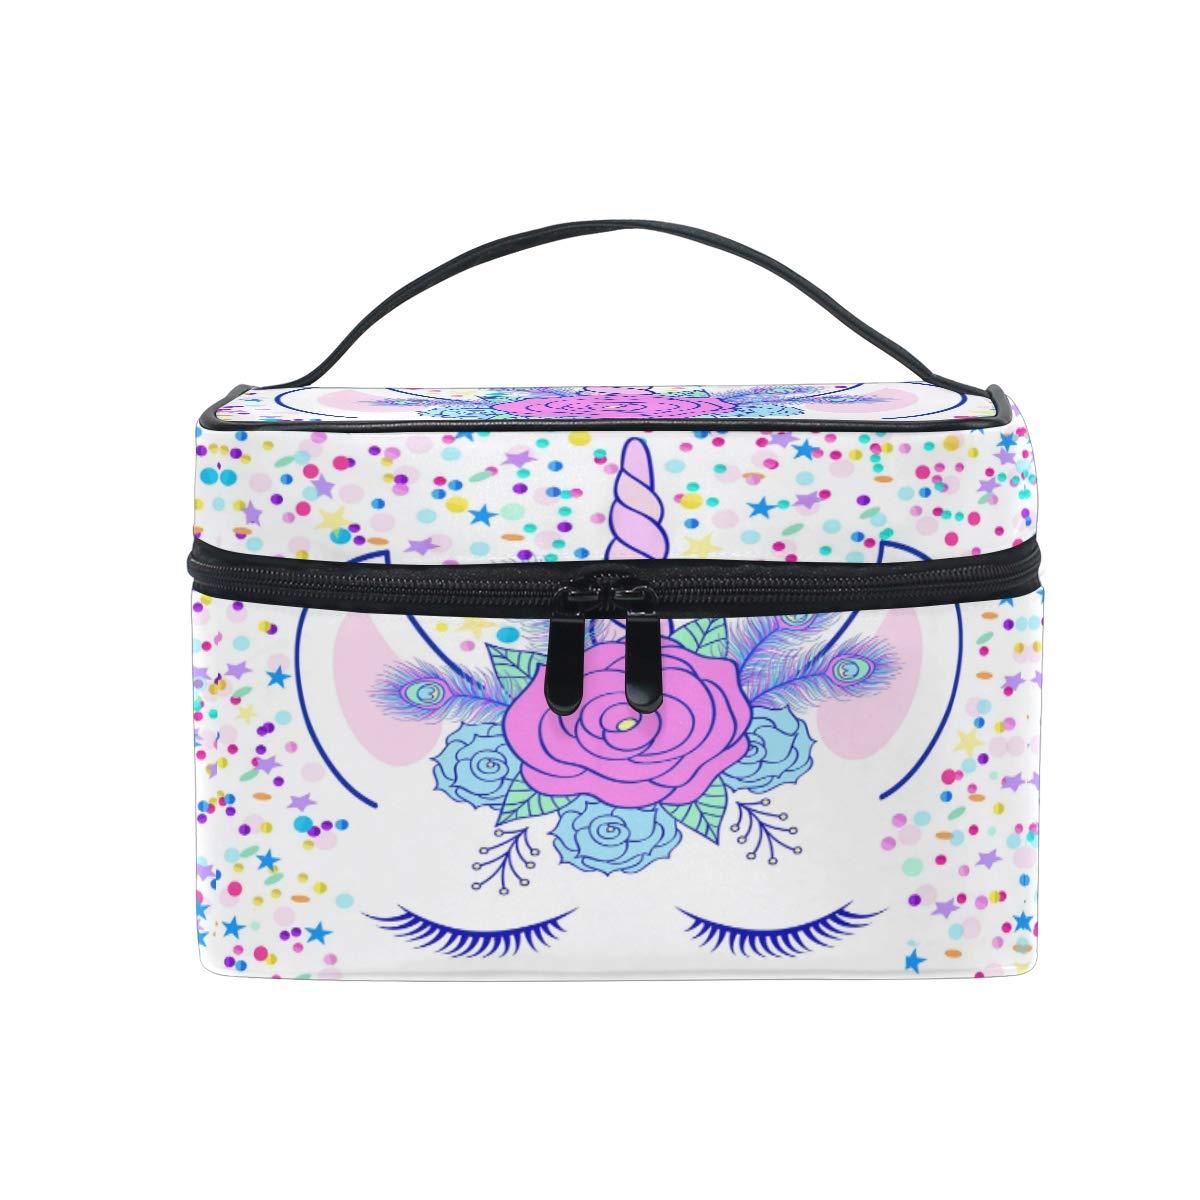 ZOEO Makeup Train Case Cream Unicorn Head Cute Cat Eye Star Korean Carrying Portable Zip Travel Cosmetic Brush Bag Organizer Large for Girls Women